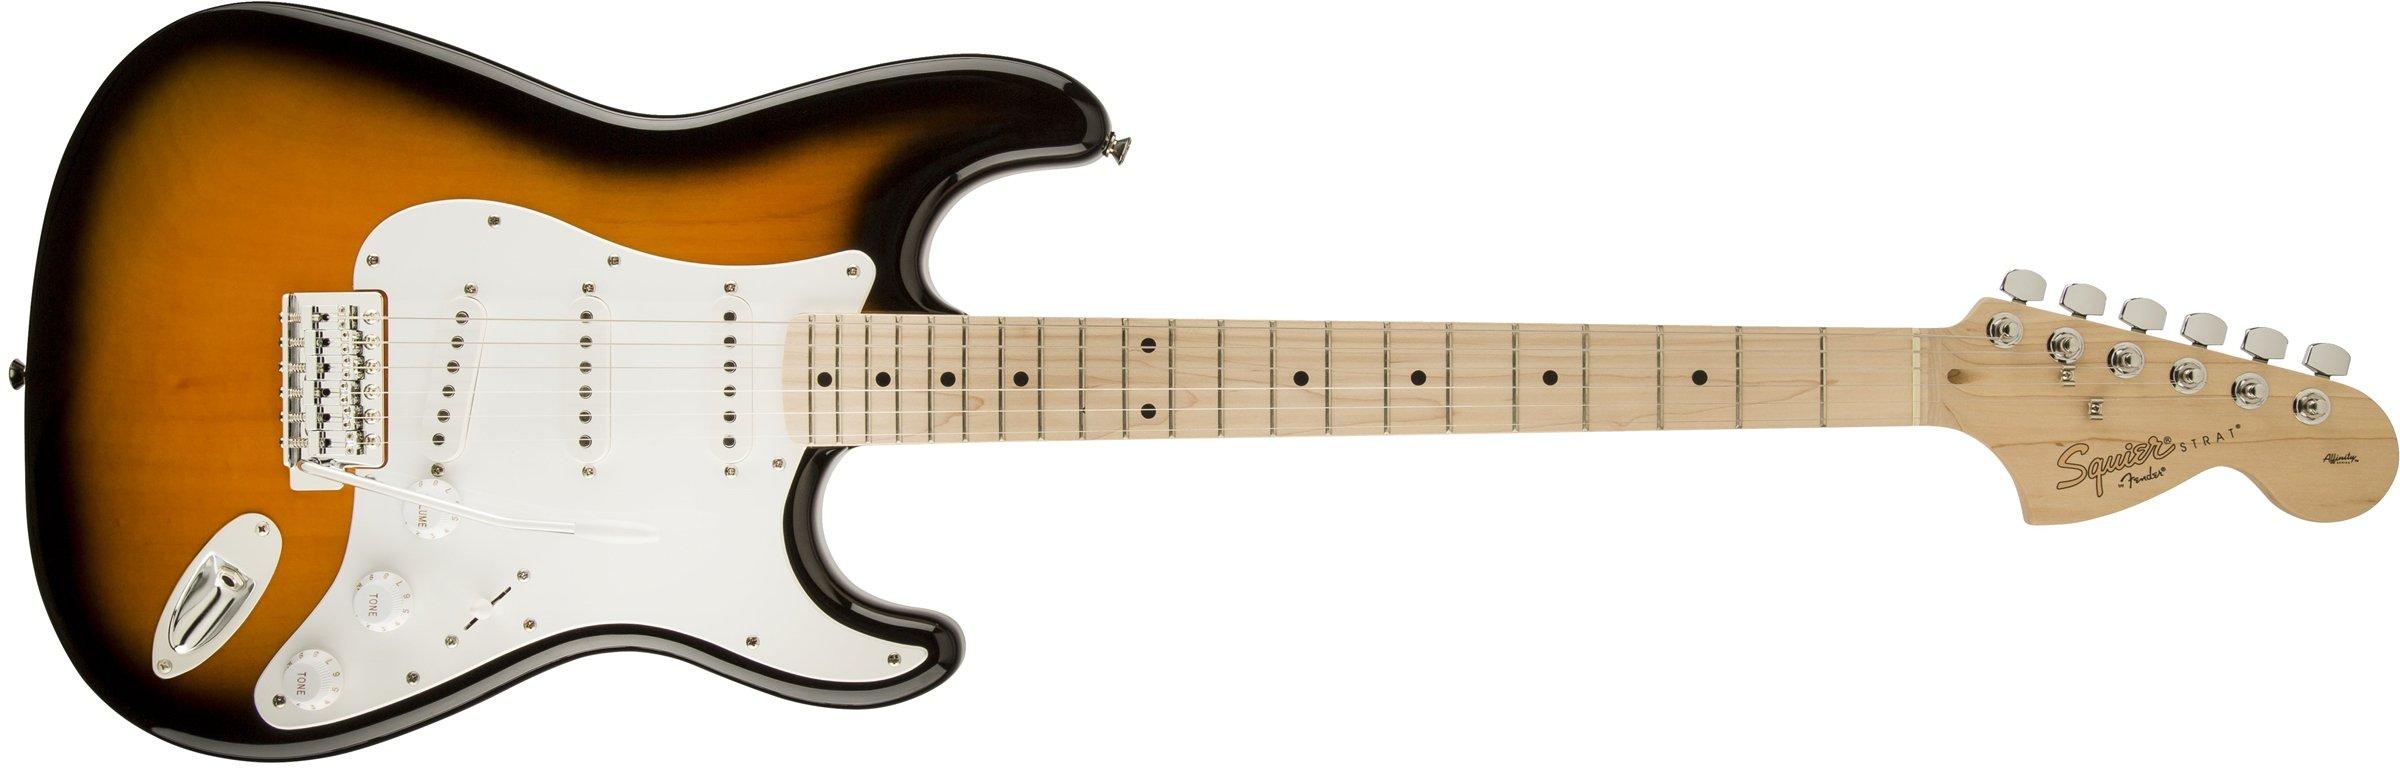 Fender 6 String Solid-Body Electric Guitar, Right Handed, 2-Color Sunburst (0310603503) by Fender